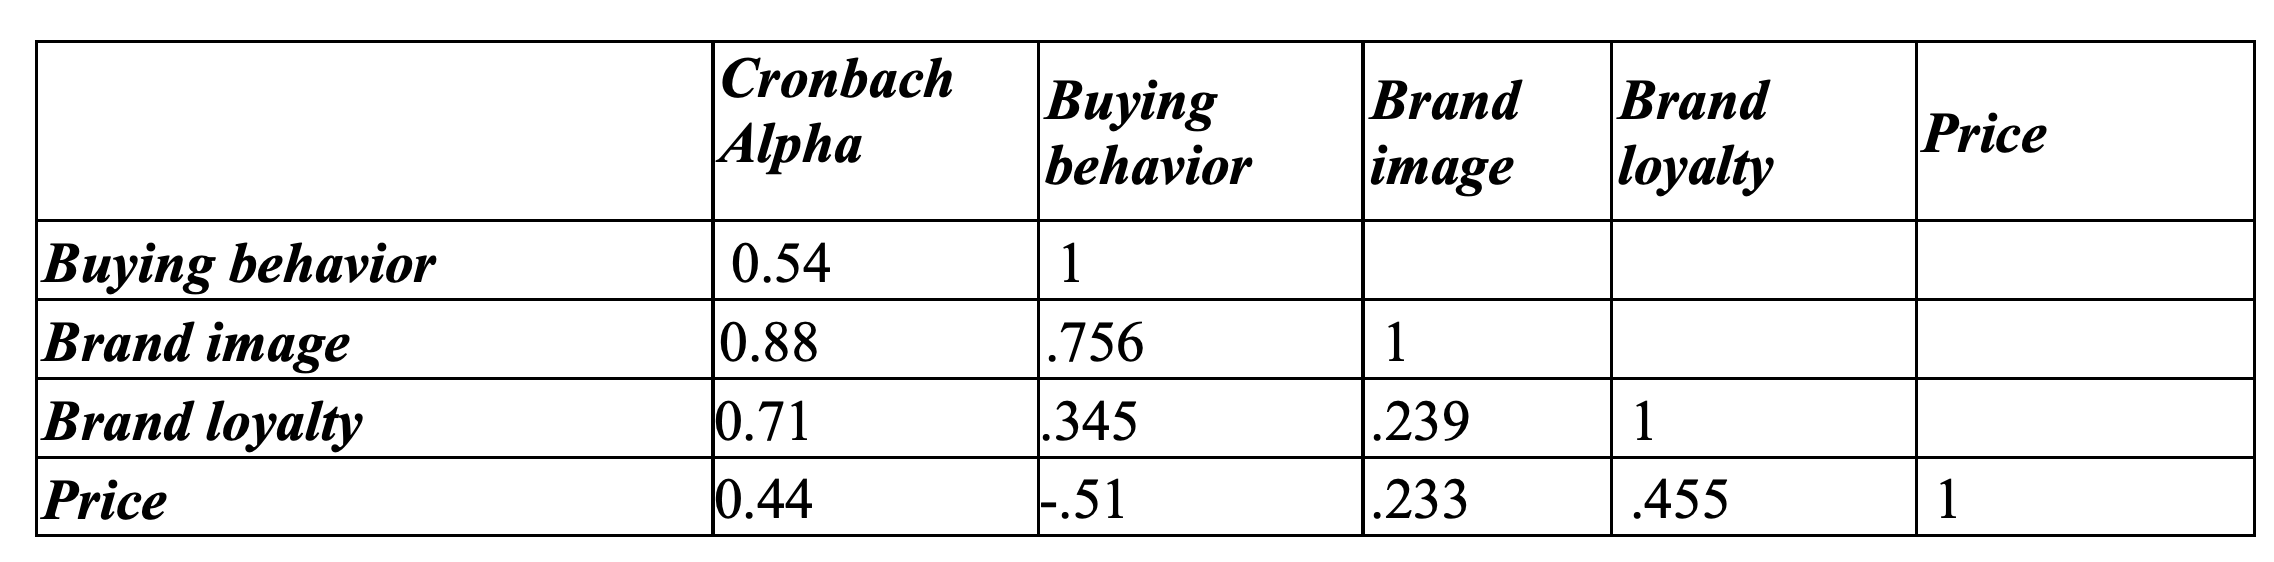 Cronbach Alpha Buying behavior Brand image Brand loyalty Price 0.54 1 0.88 1 Buying behavior Brand image Brand loyalty Price